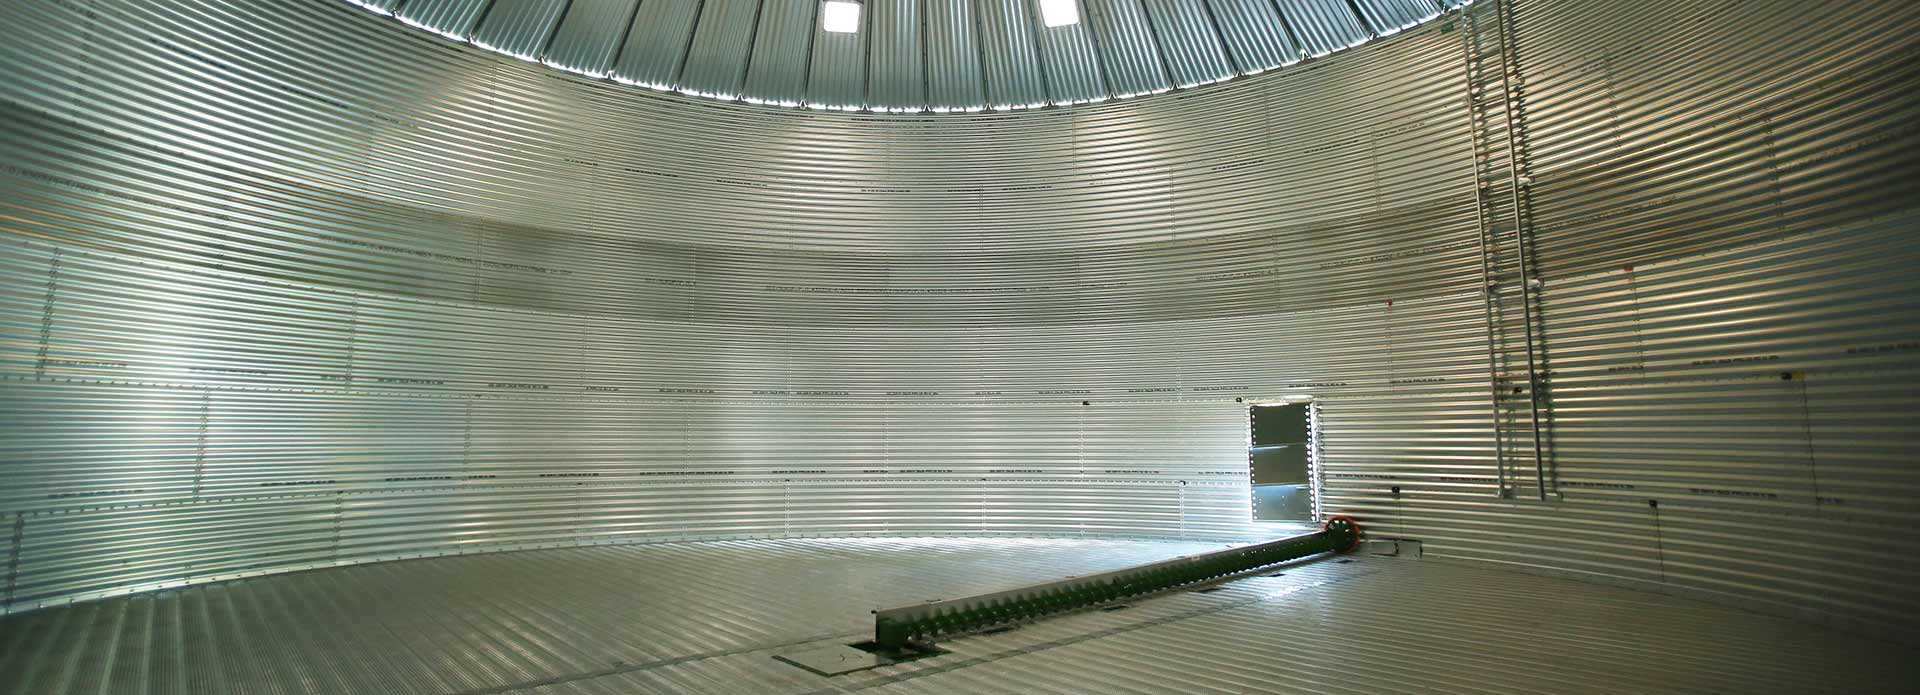 Eldon-C-Stutsman-Inc-Inside-Grain-Bin-(1)